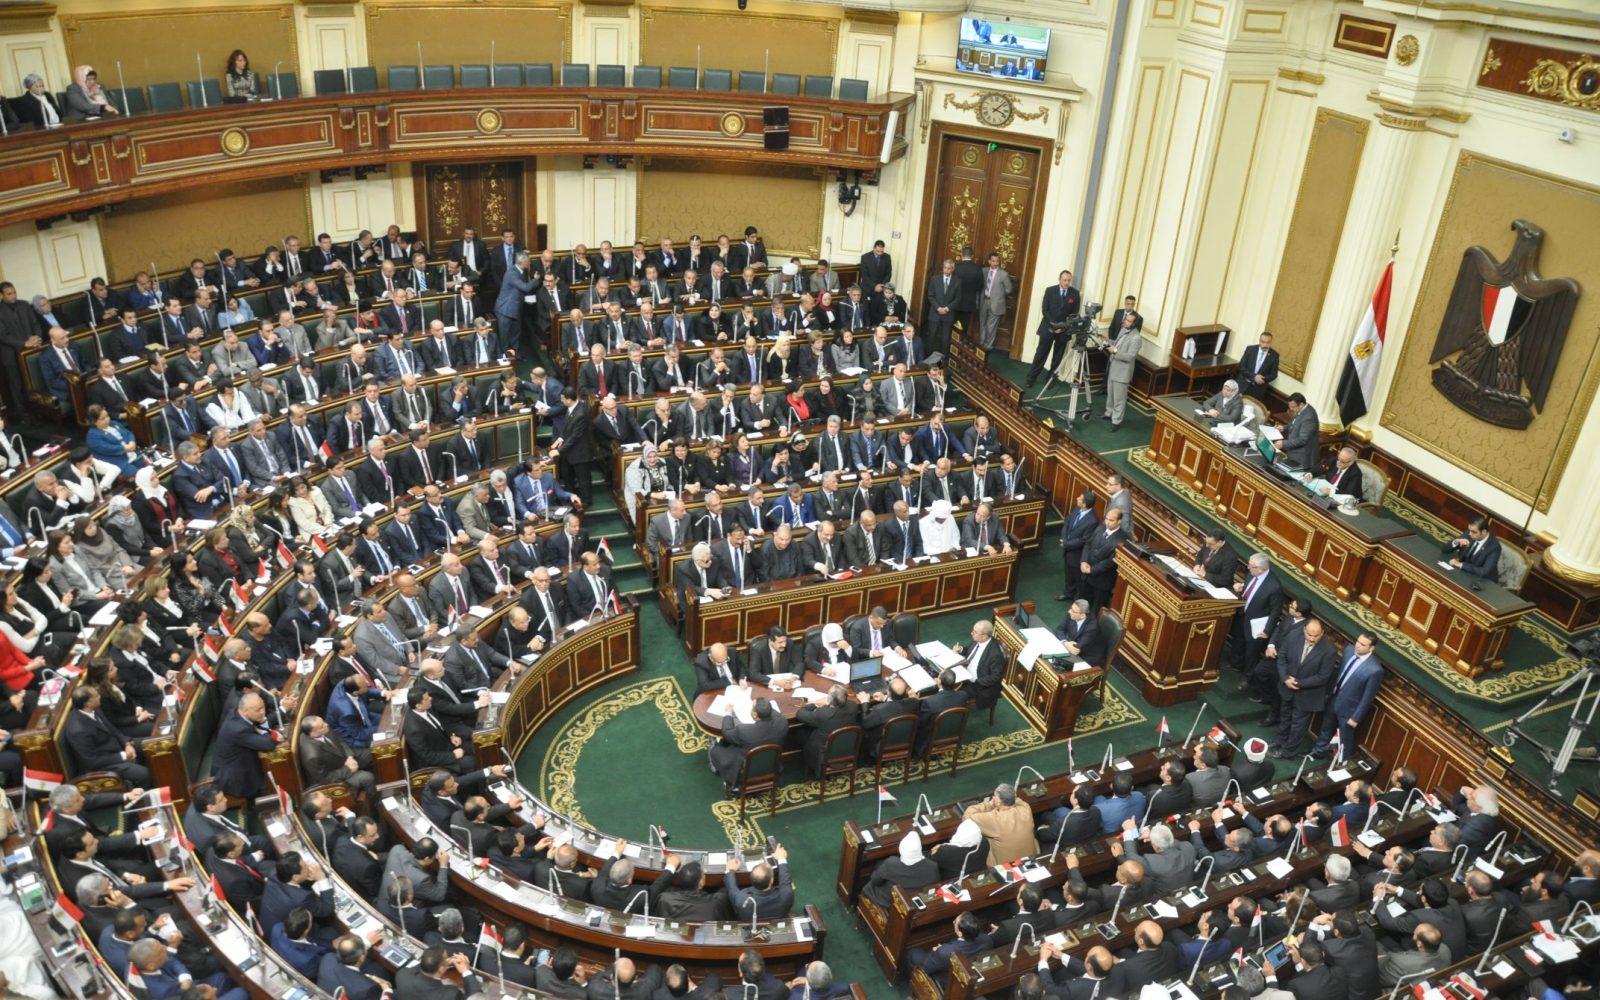 2021-08-29 Egypt Parliament 01